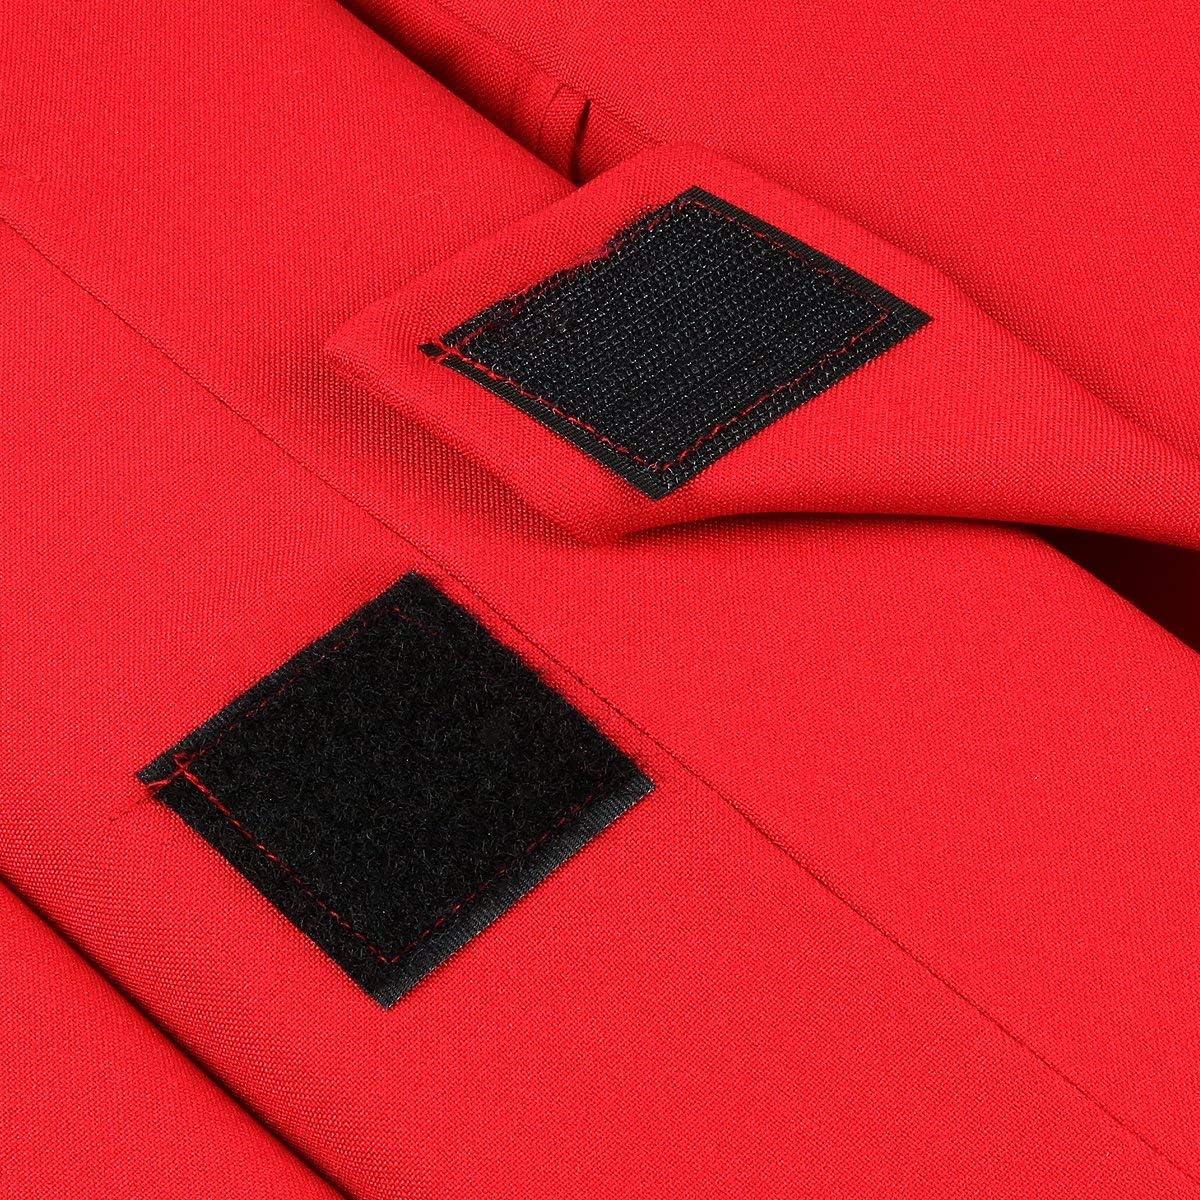 Magshion Futon Furniture Sleeper Chair Folding Foam Bed Choose Color /& Sized Single,Twin or Full 5x36x70 , Burgundy Twin